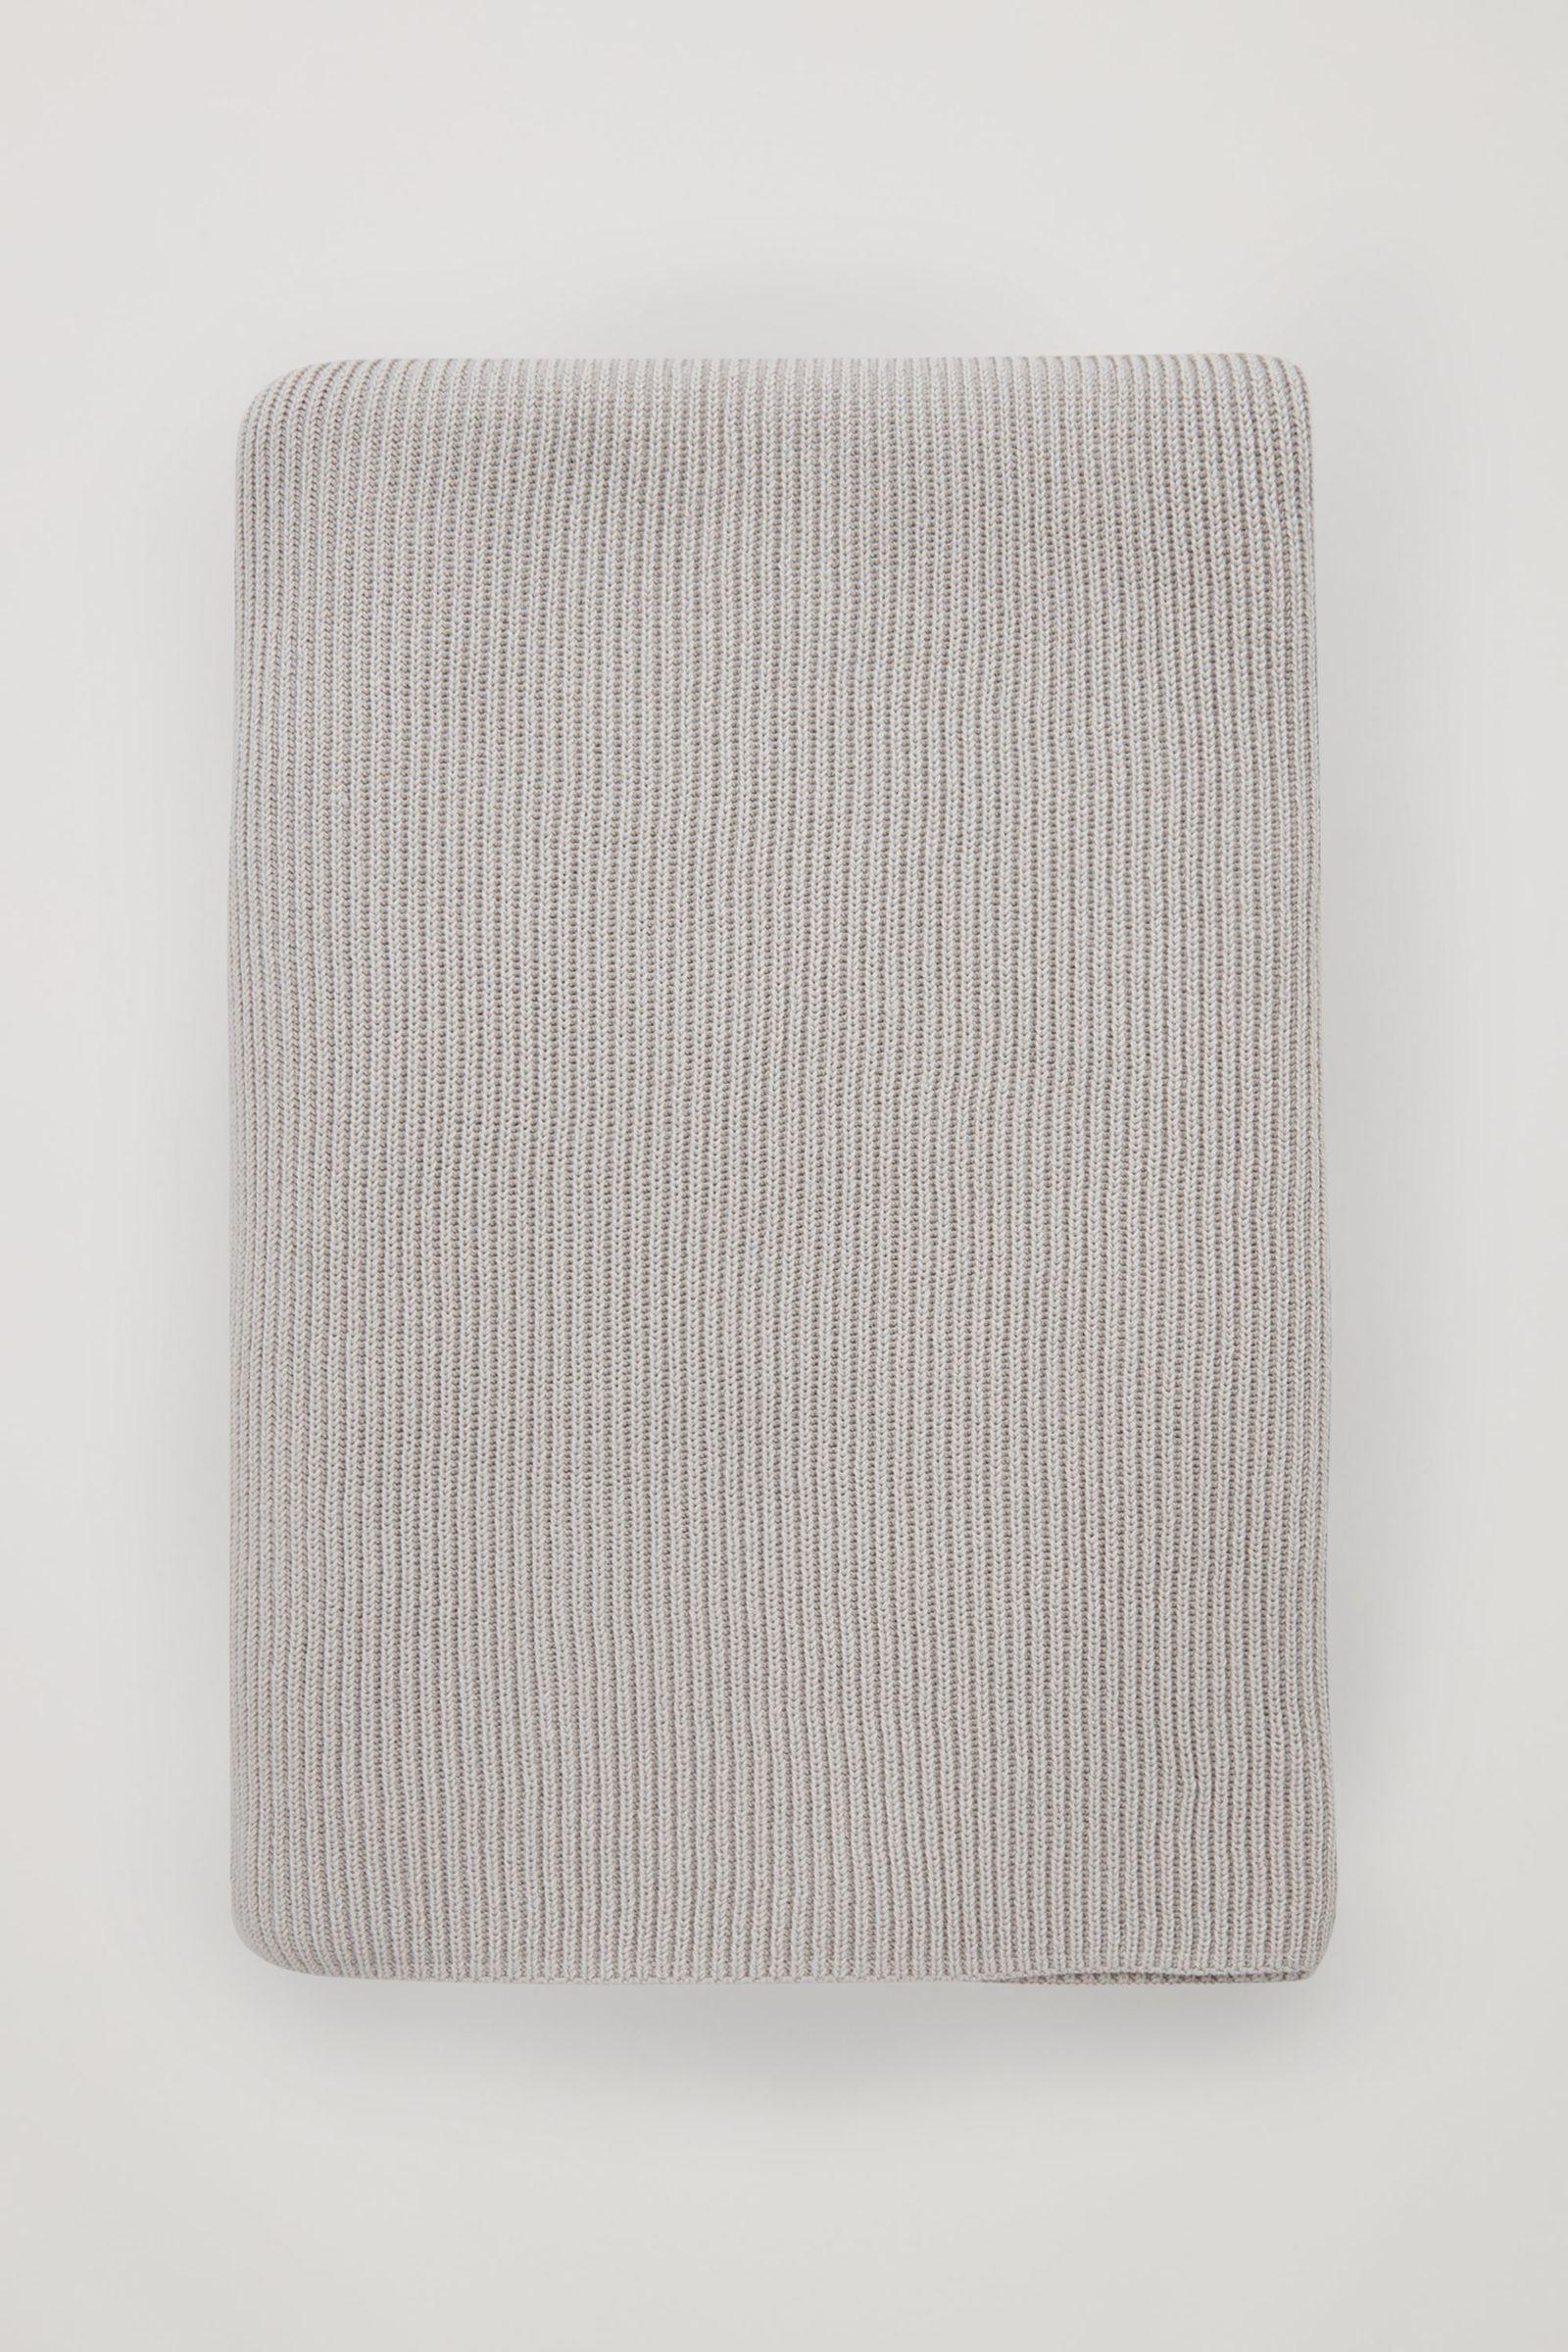 COS 울 믹스 블랭킷 스카프의 라이트 베이지컬러 Product입니다.